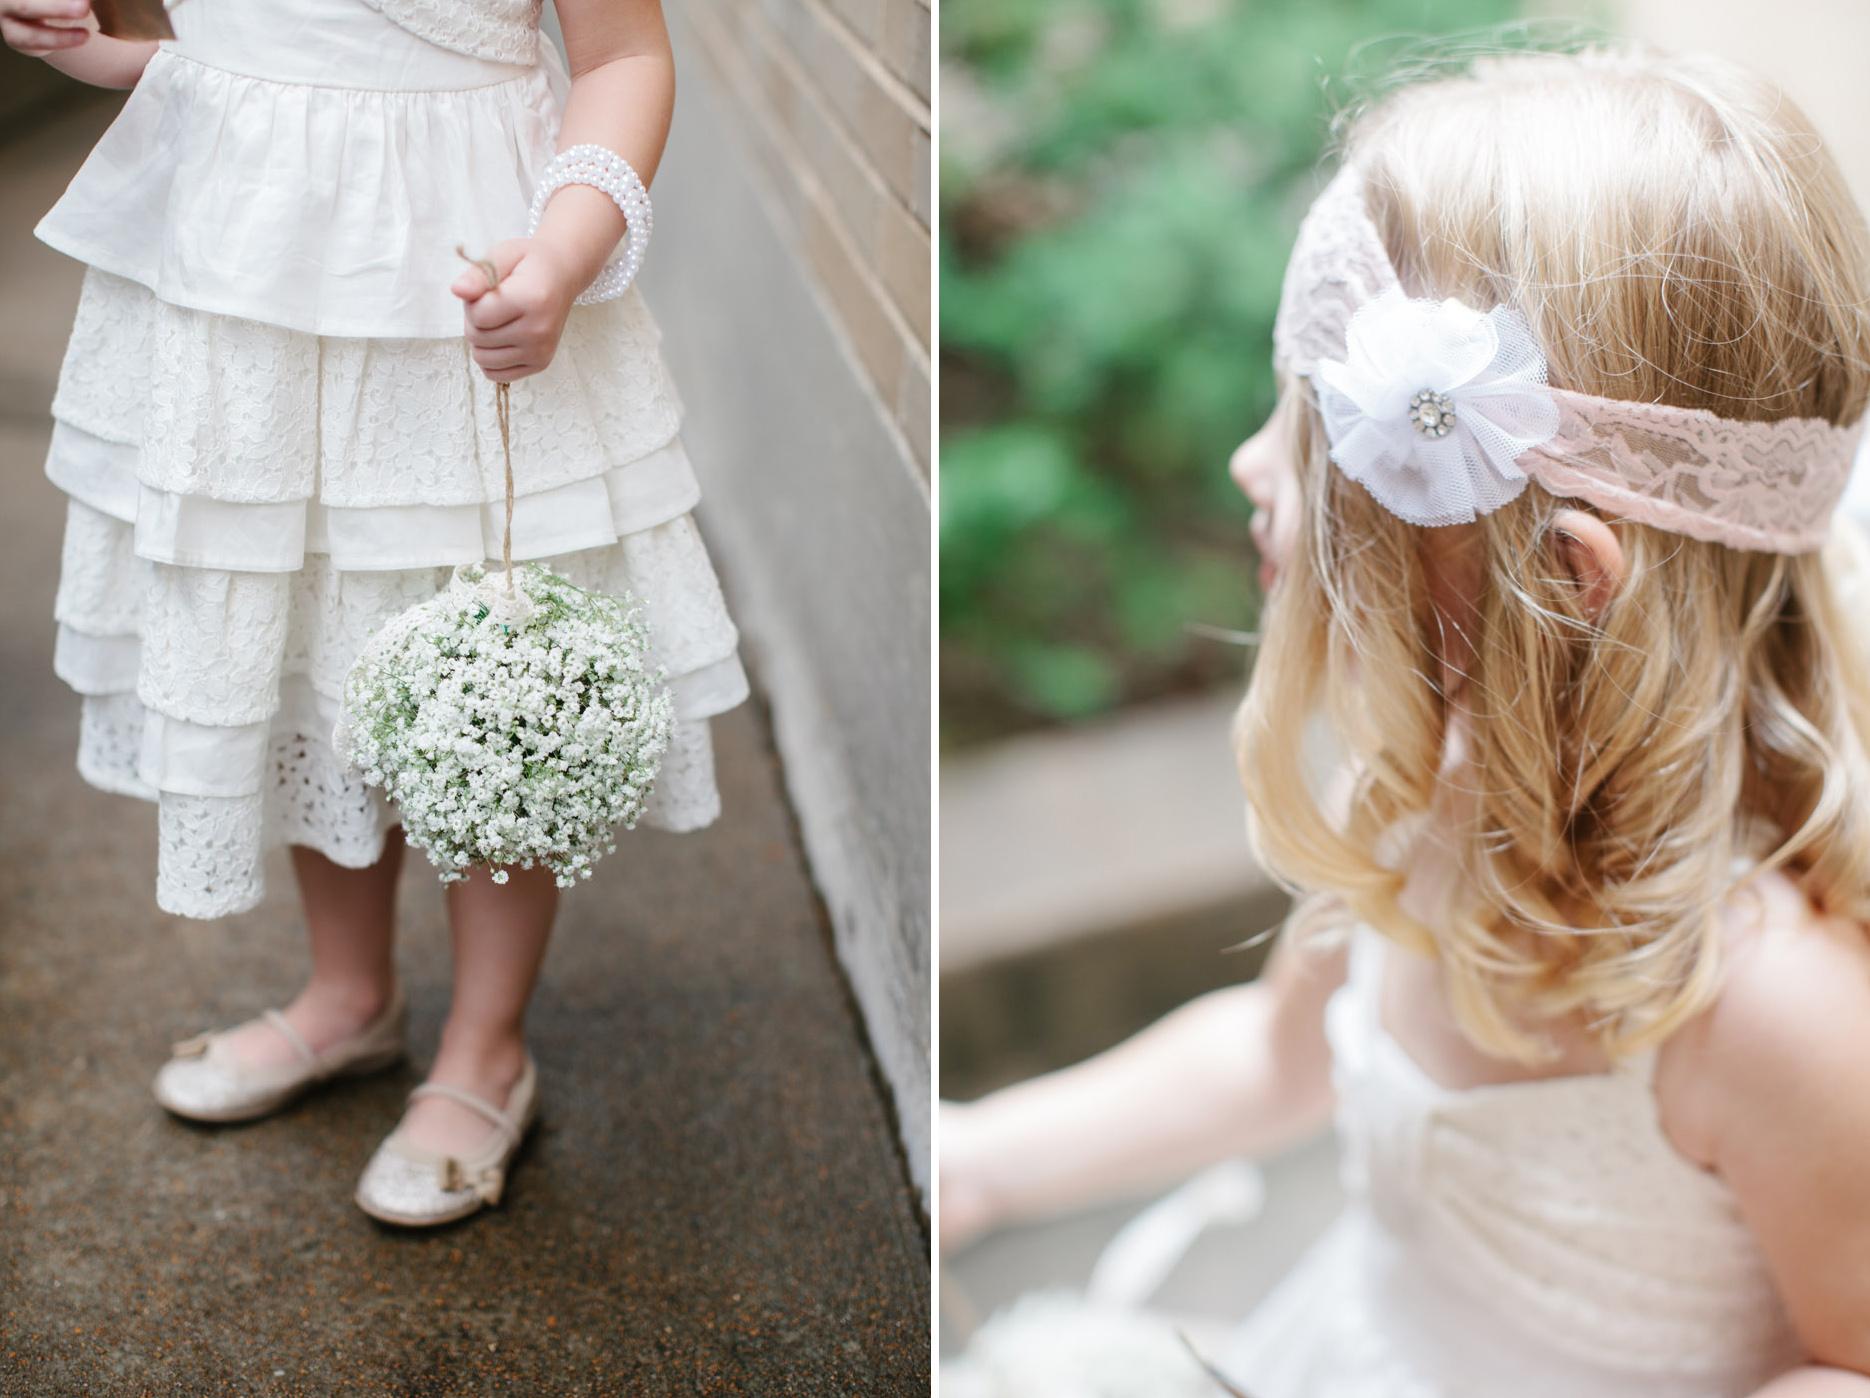 St-Louis-Wedding-Photography-1029-copy.jpg